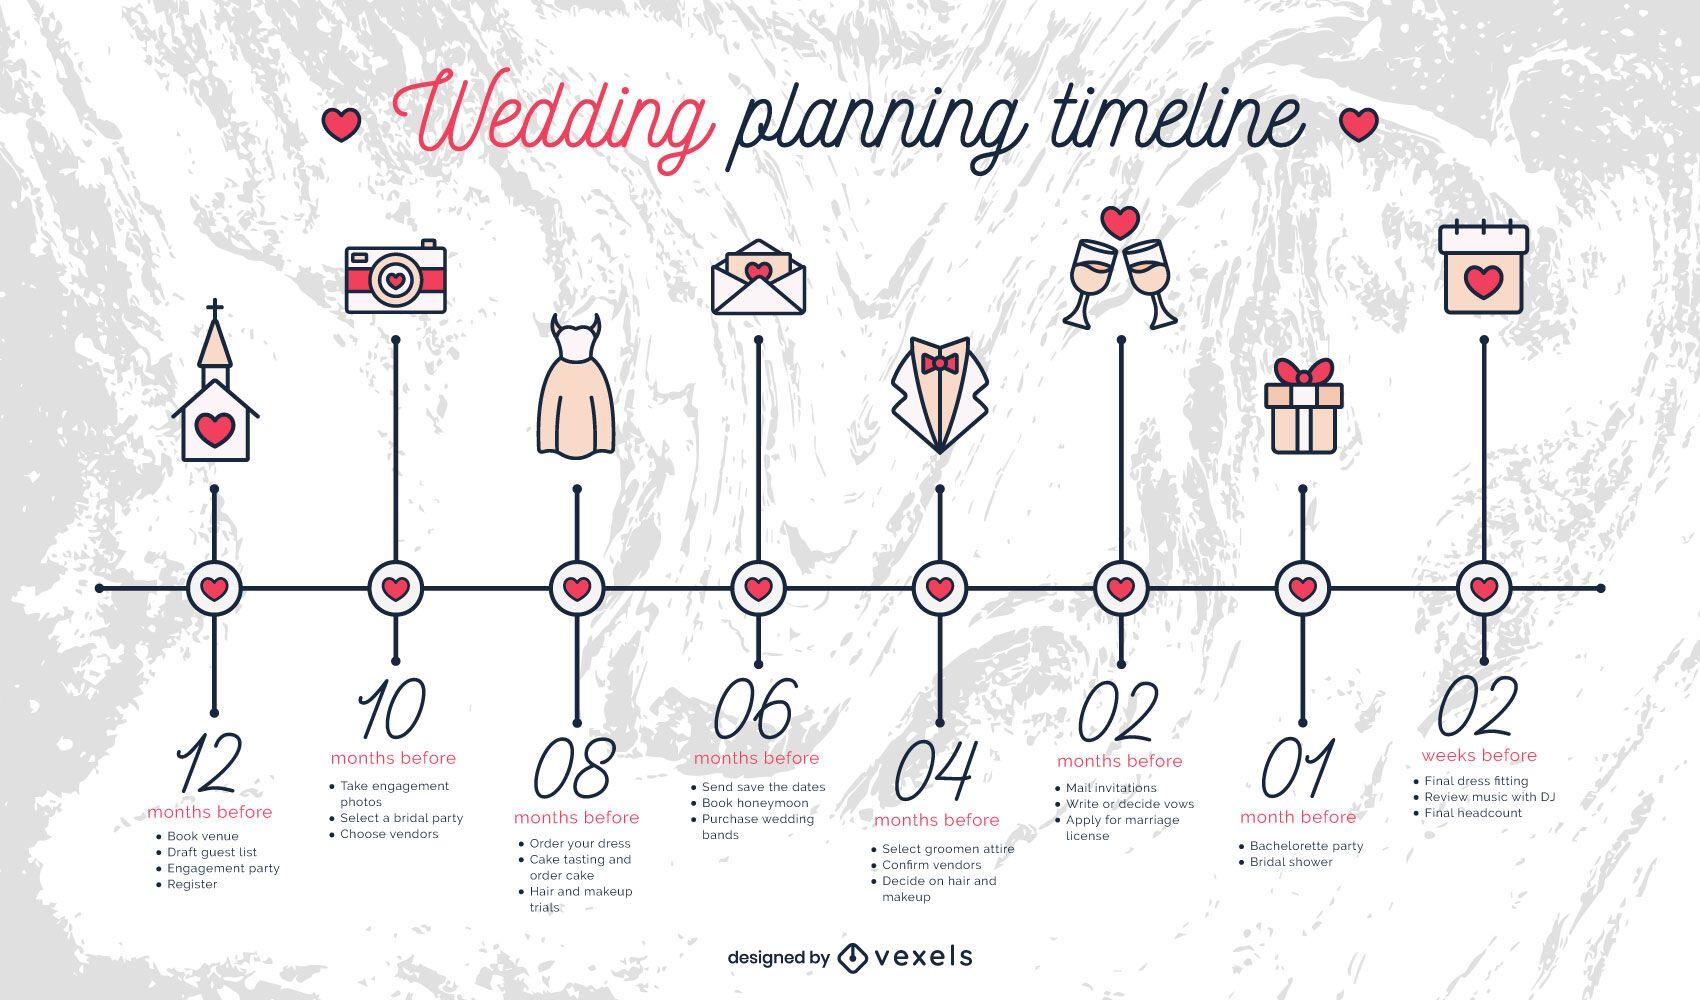 Cronograma de planificación de bodas